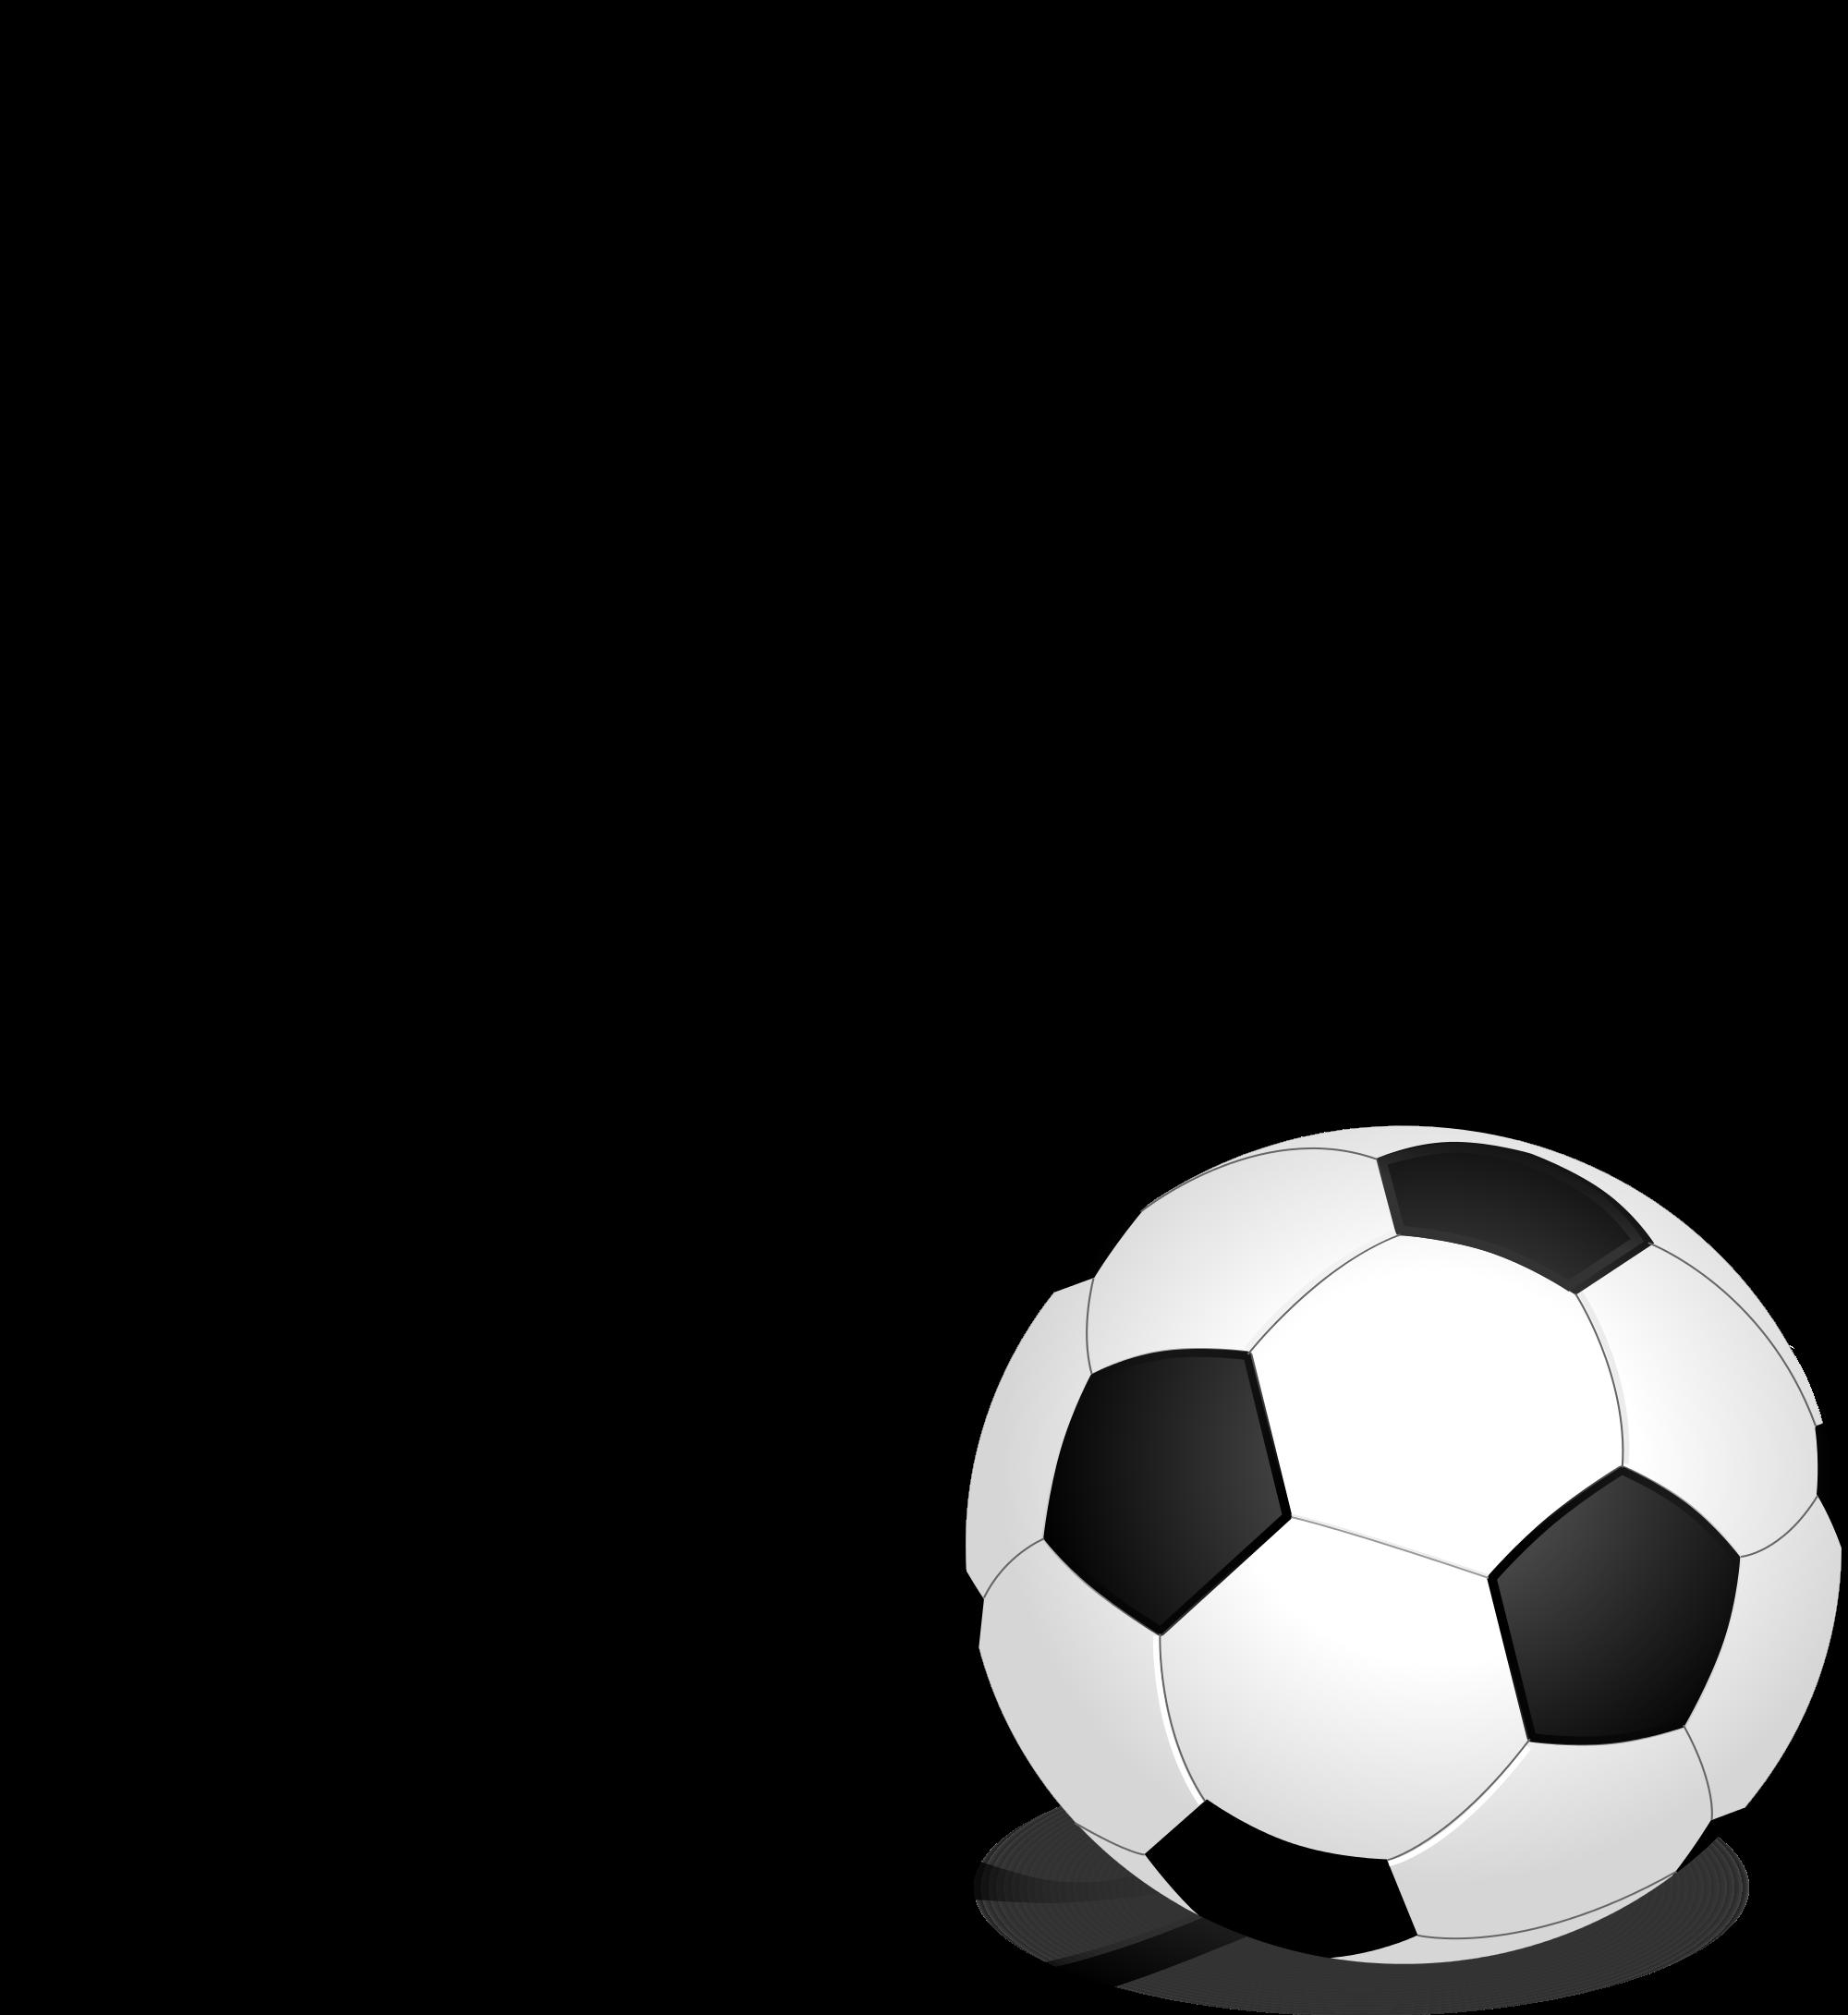 Blank football jersey clipart jpg transparent library File:Football-Players-100-match.svg - Wikimedia Commons jpg transparent library